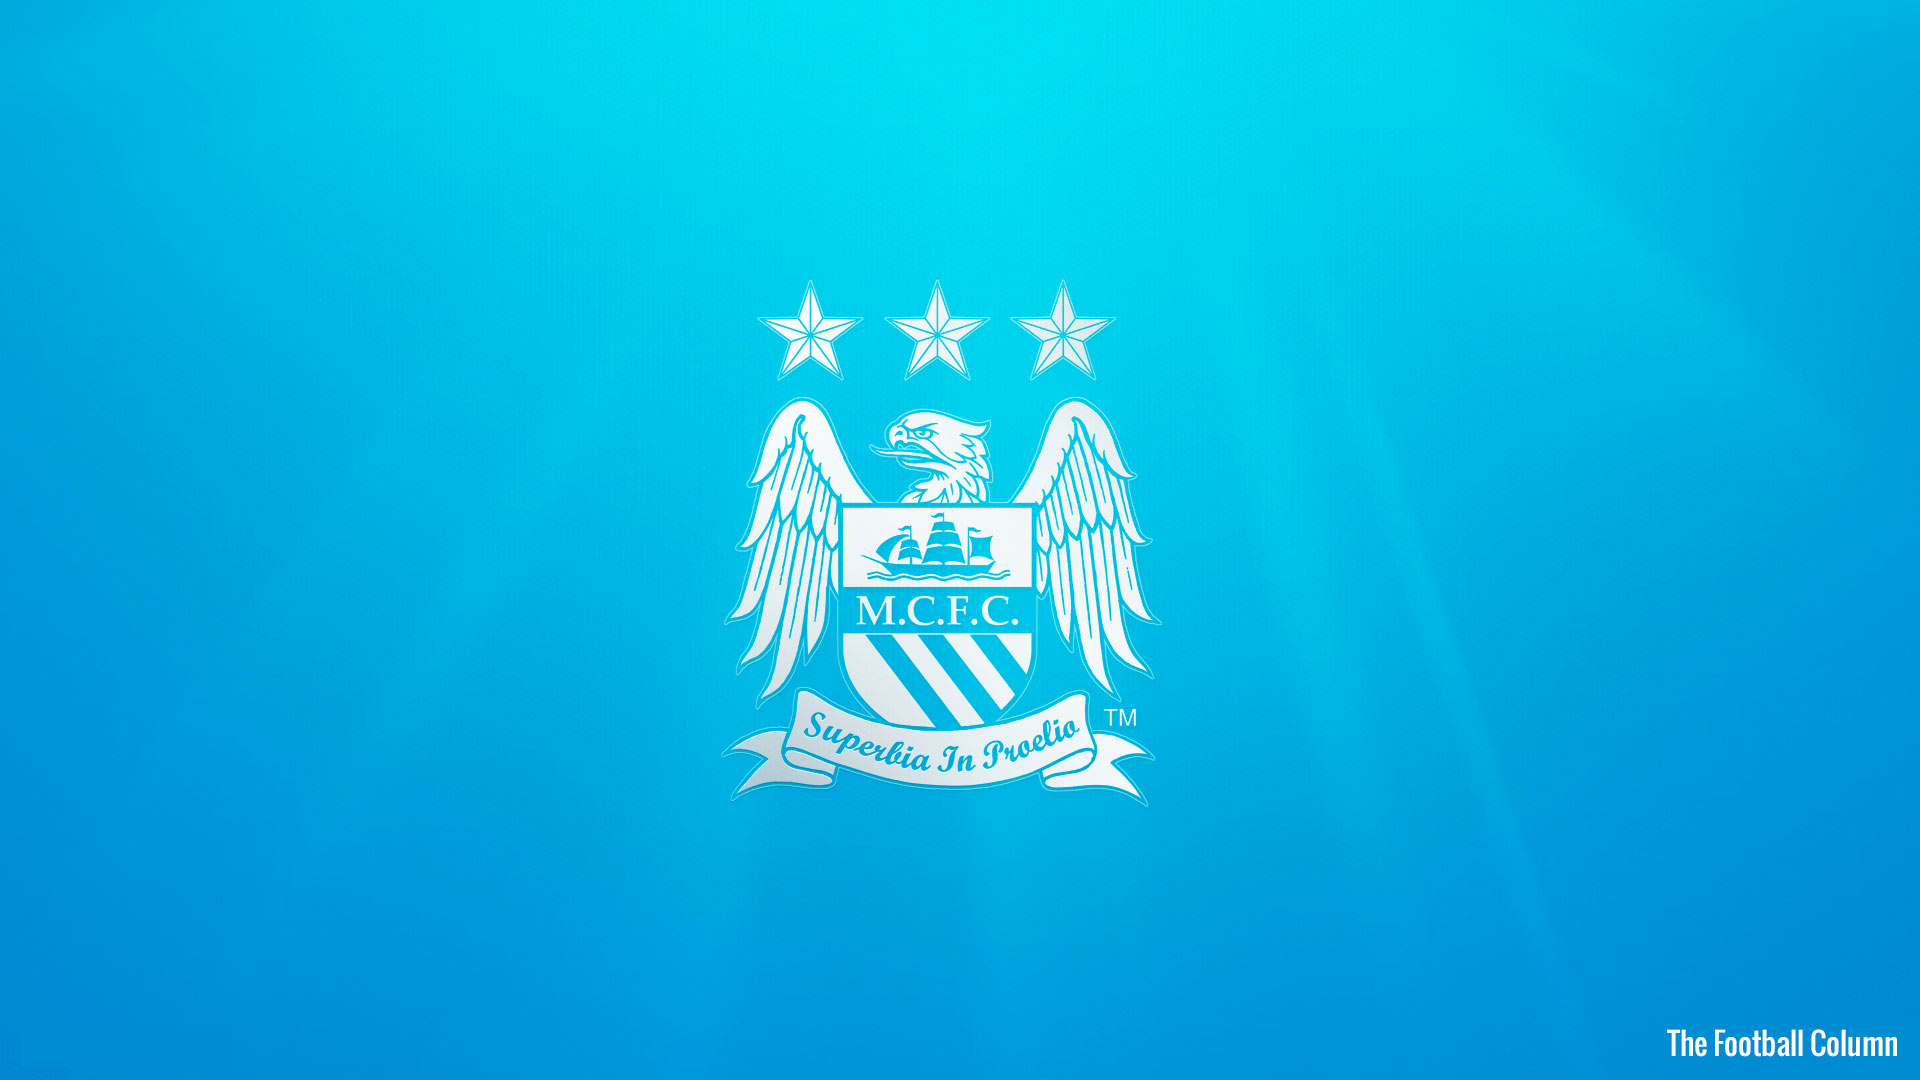 Manchester City HD Wallpapers The Football Column 1920x1080